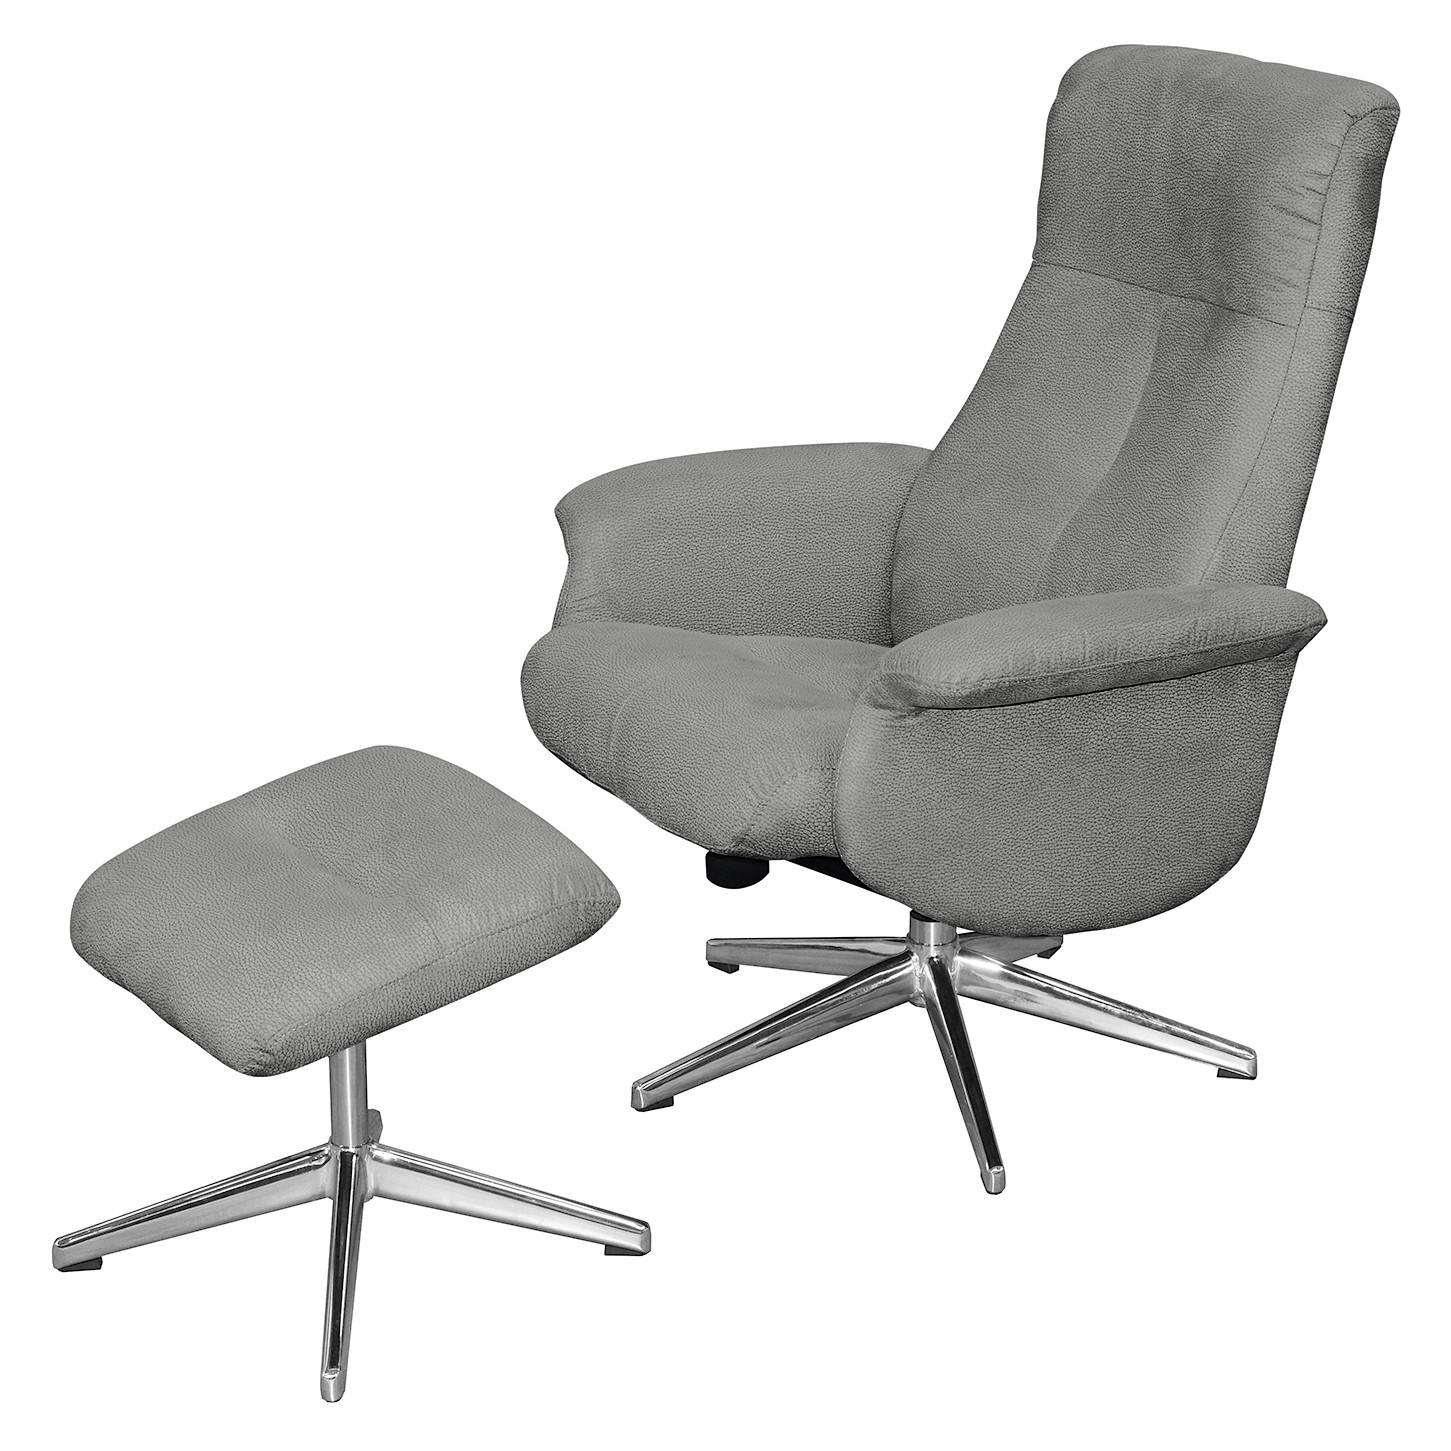 home24 Relaxsessel Savassi I   Wohnzimmer > Sessel > Relaxsessel   Siehe shop   Fredriks